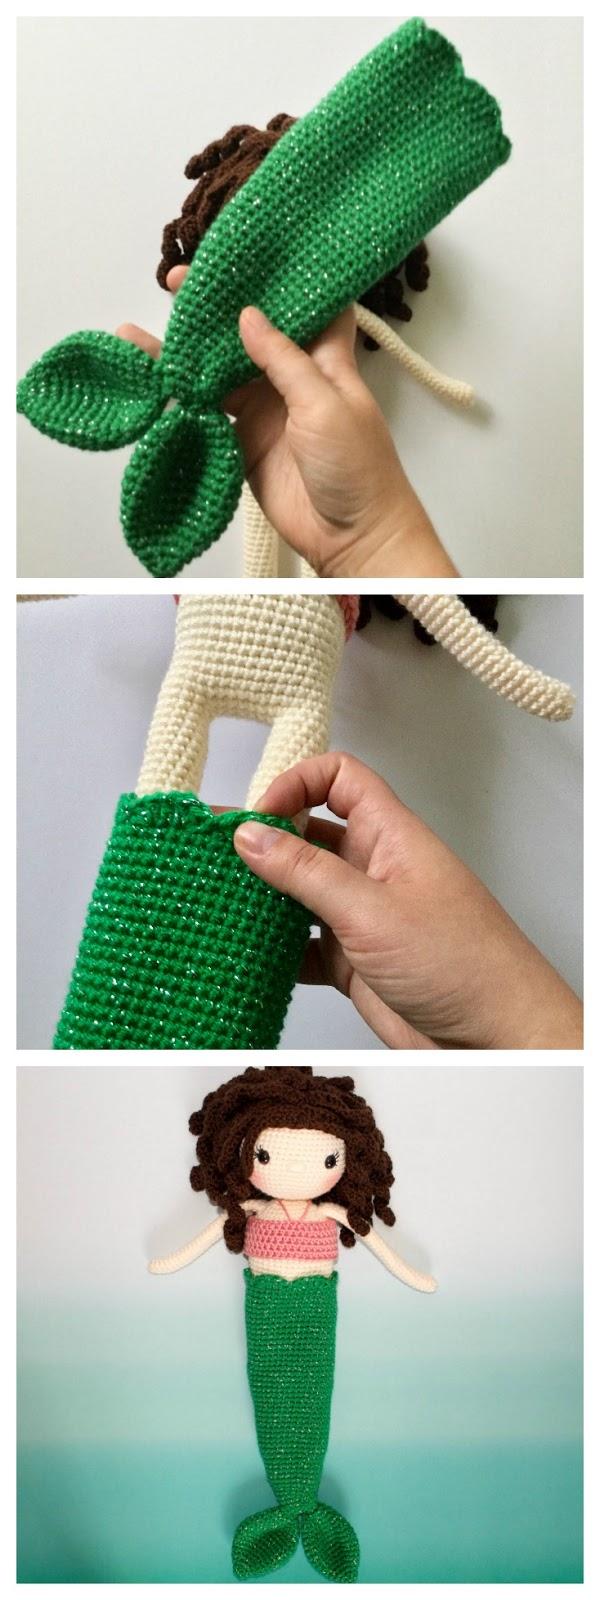 Amigurumi crochet doll- Fooly the clown ⋆ Passionatecrafter | 1600x600